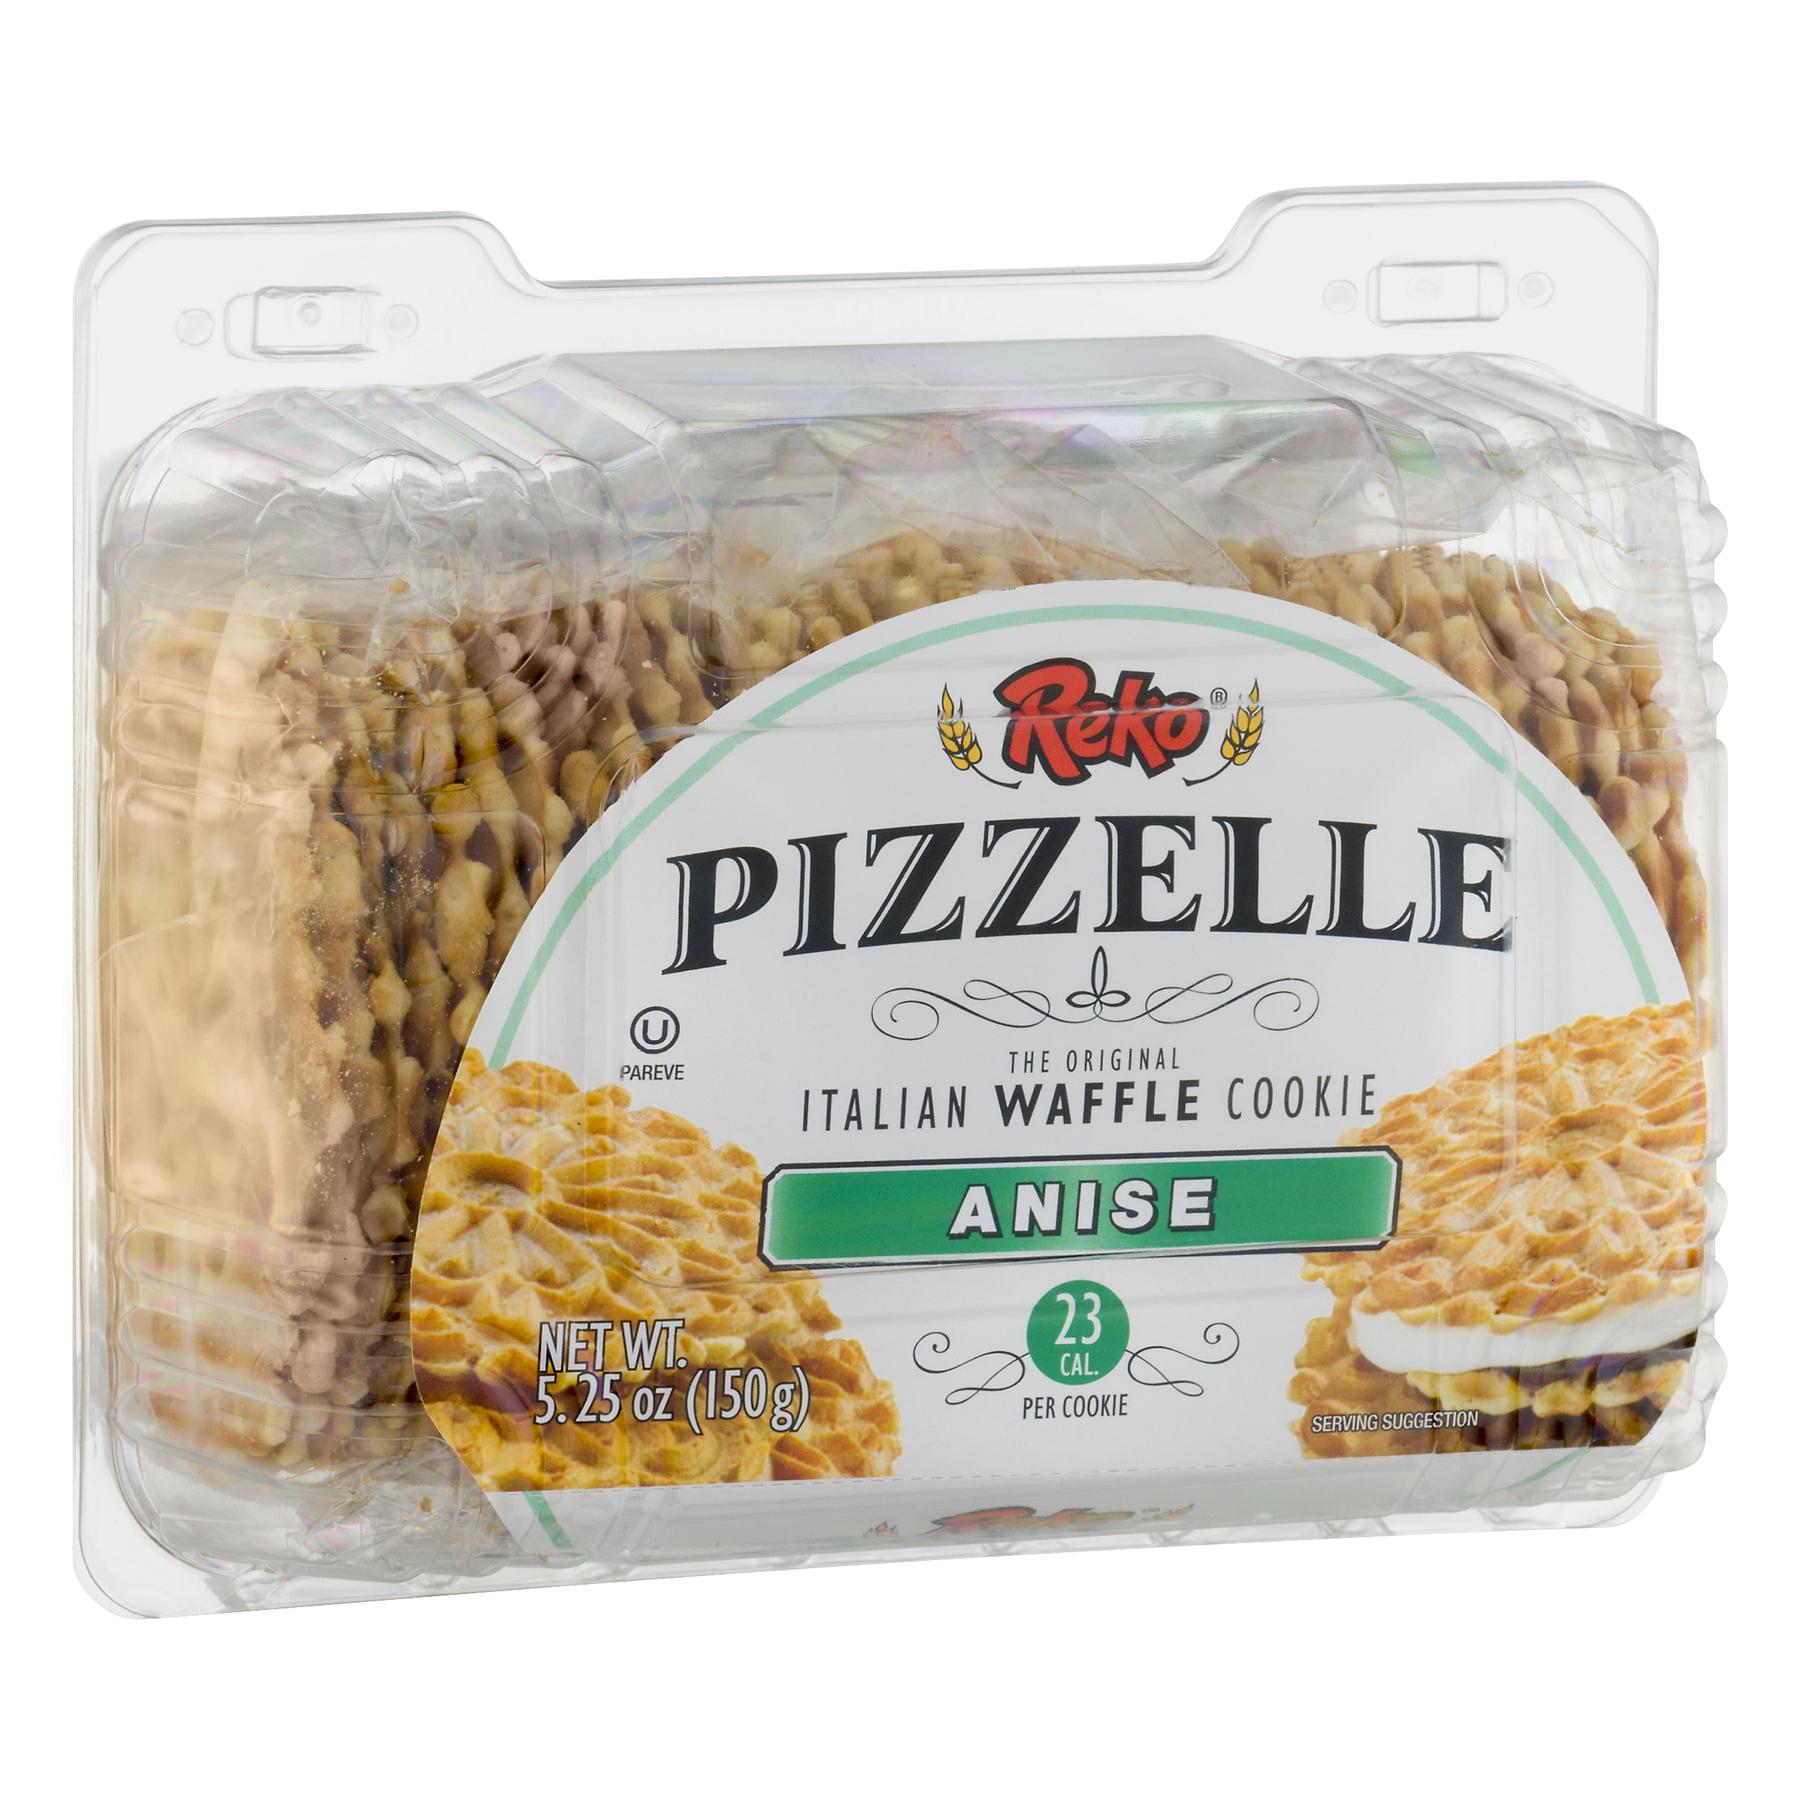 Reko Pizzelle Pizzelle Italian Cookies Anise 5.25oz - Walmart.com